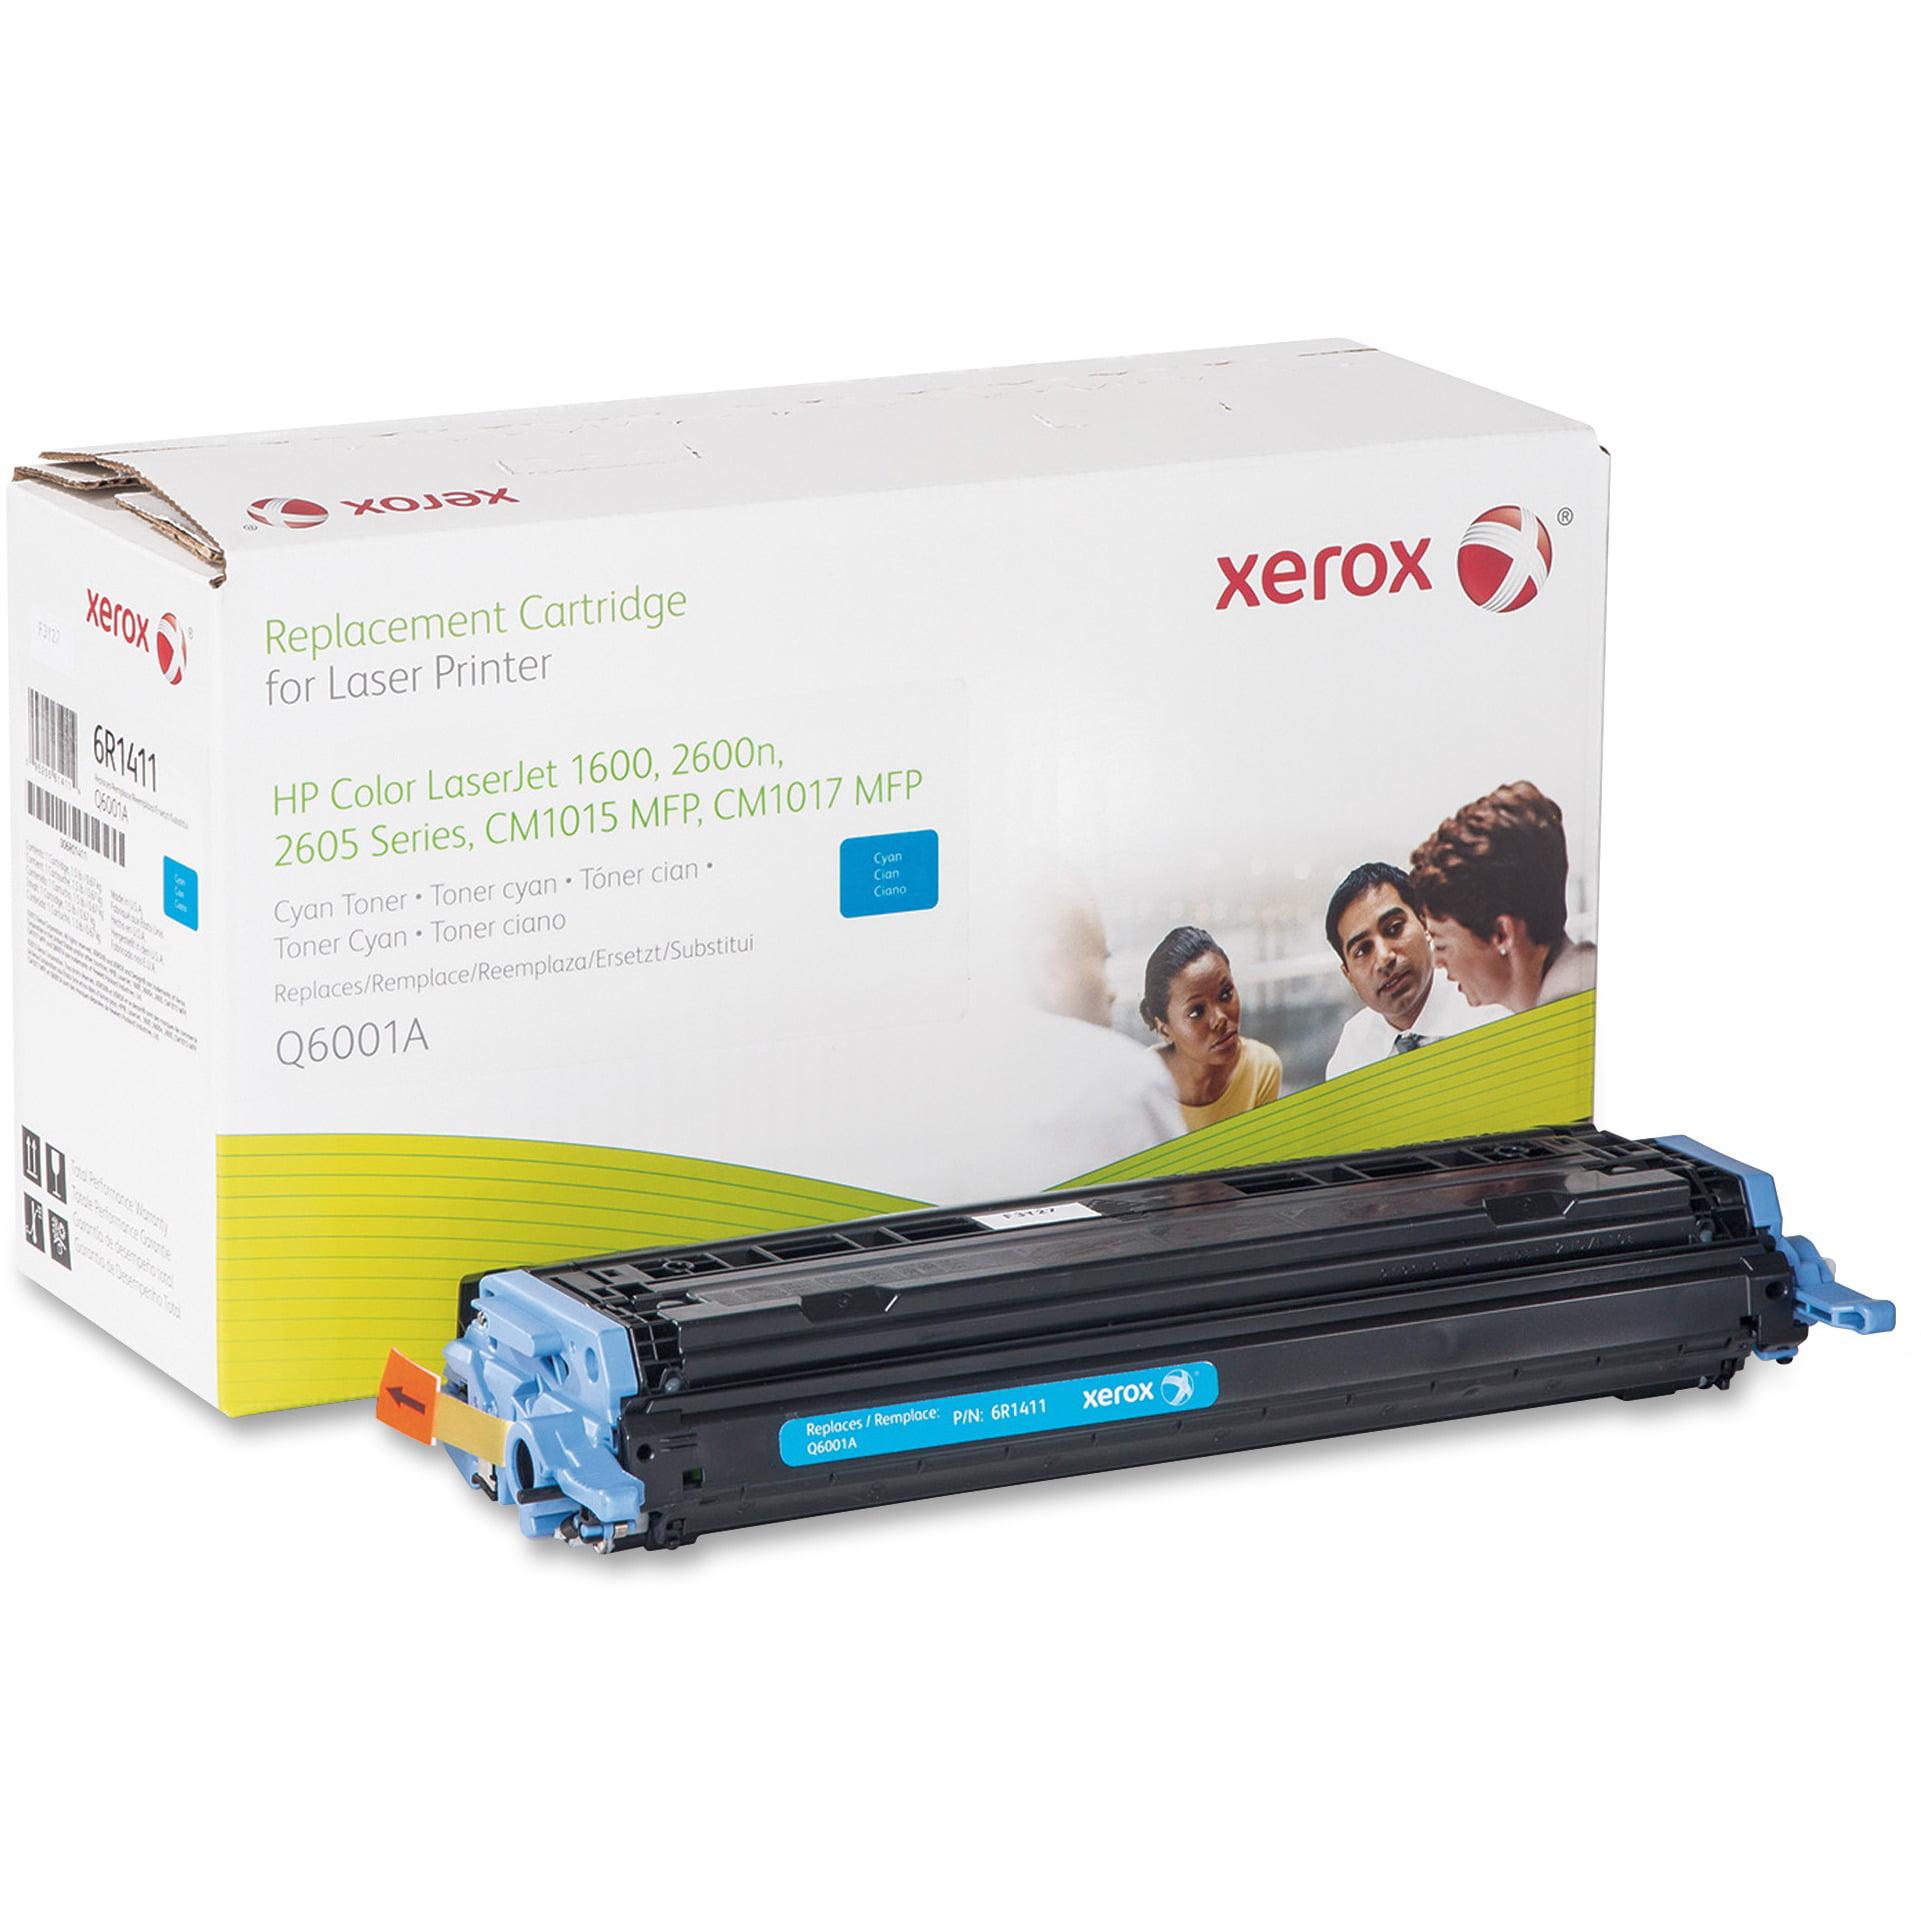 Xerox Remanufactured Toner Cartridge - Alternative for HP 124A (Q6001A), 1 Each (Quantity)